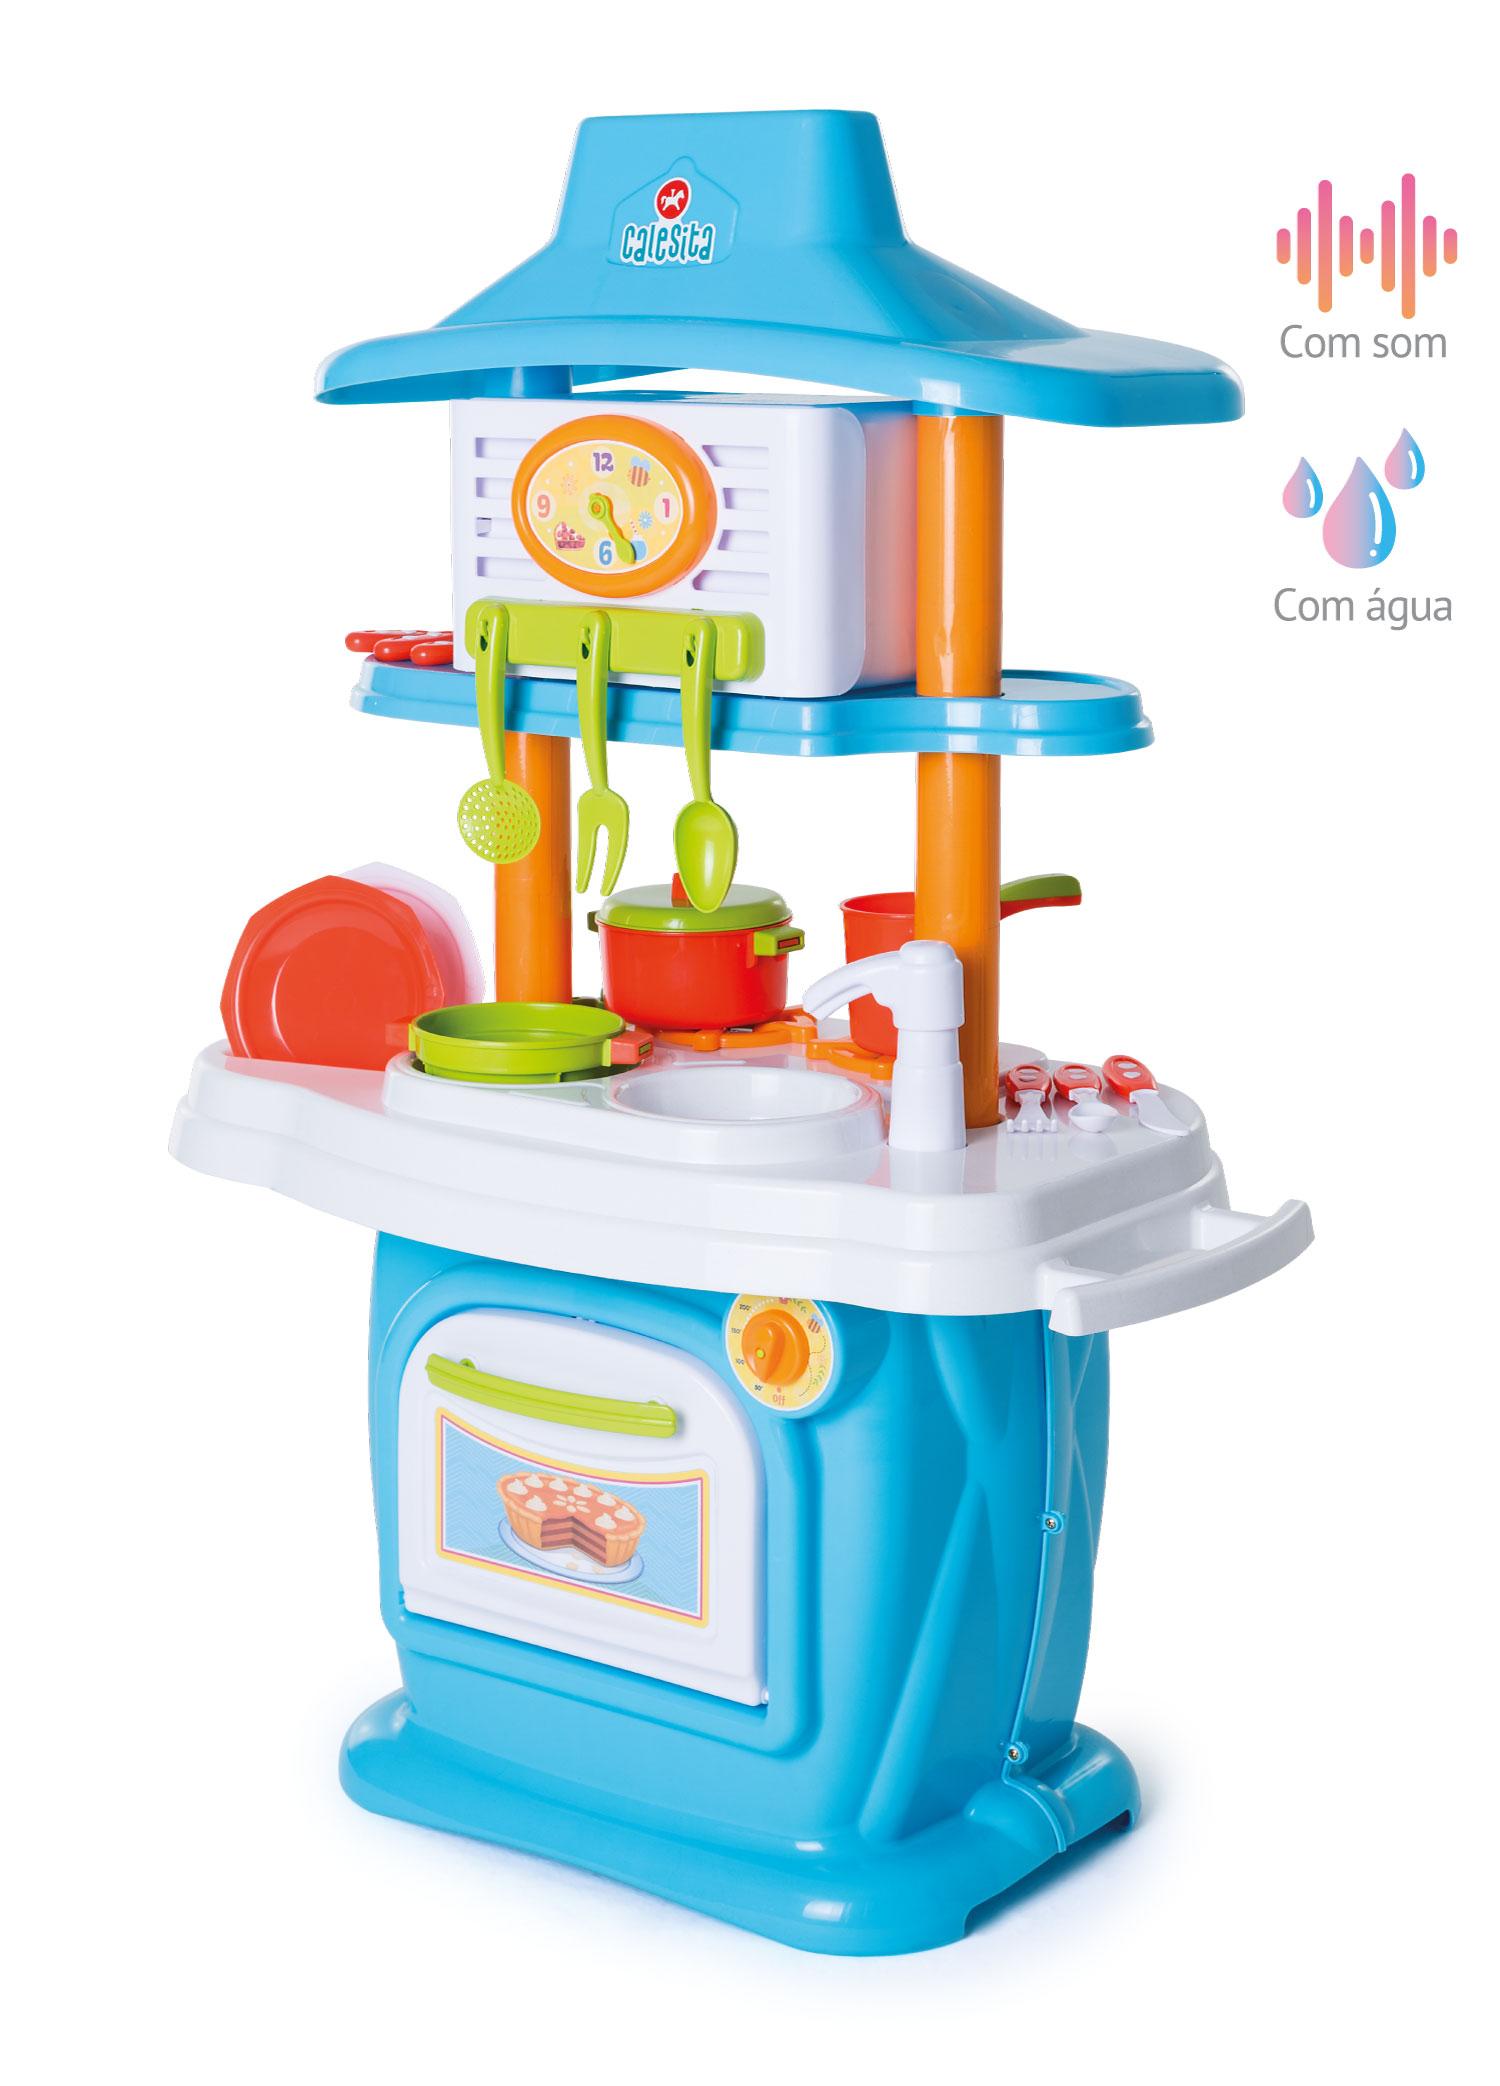 Le Grand Chef J Nior Calesita Brinquedos